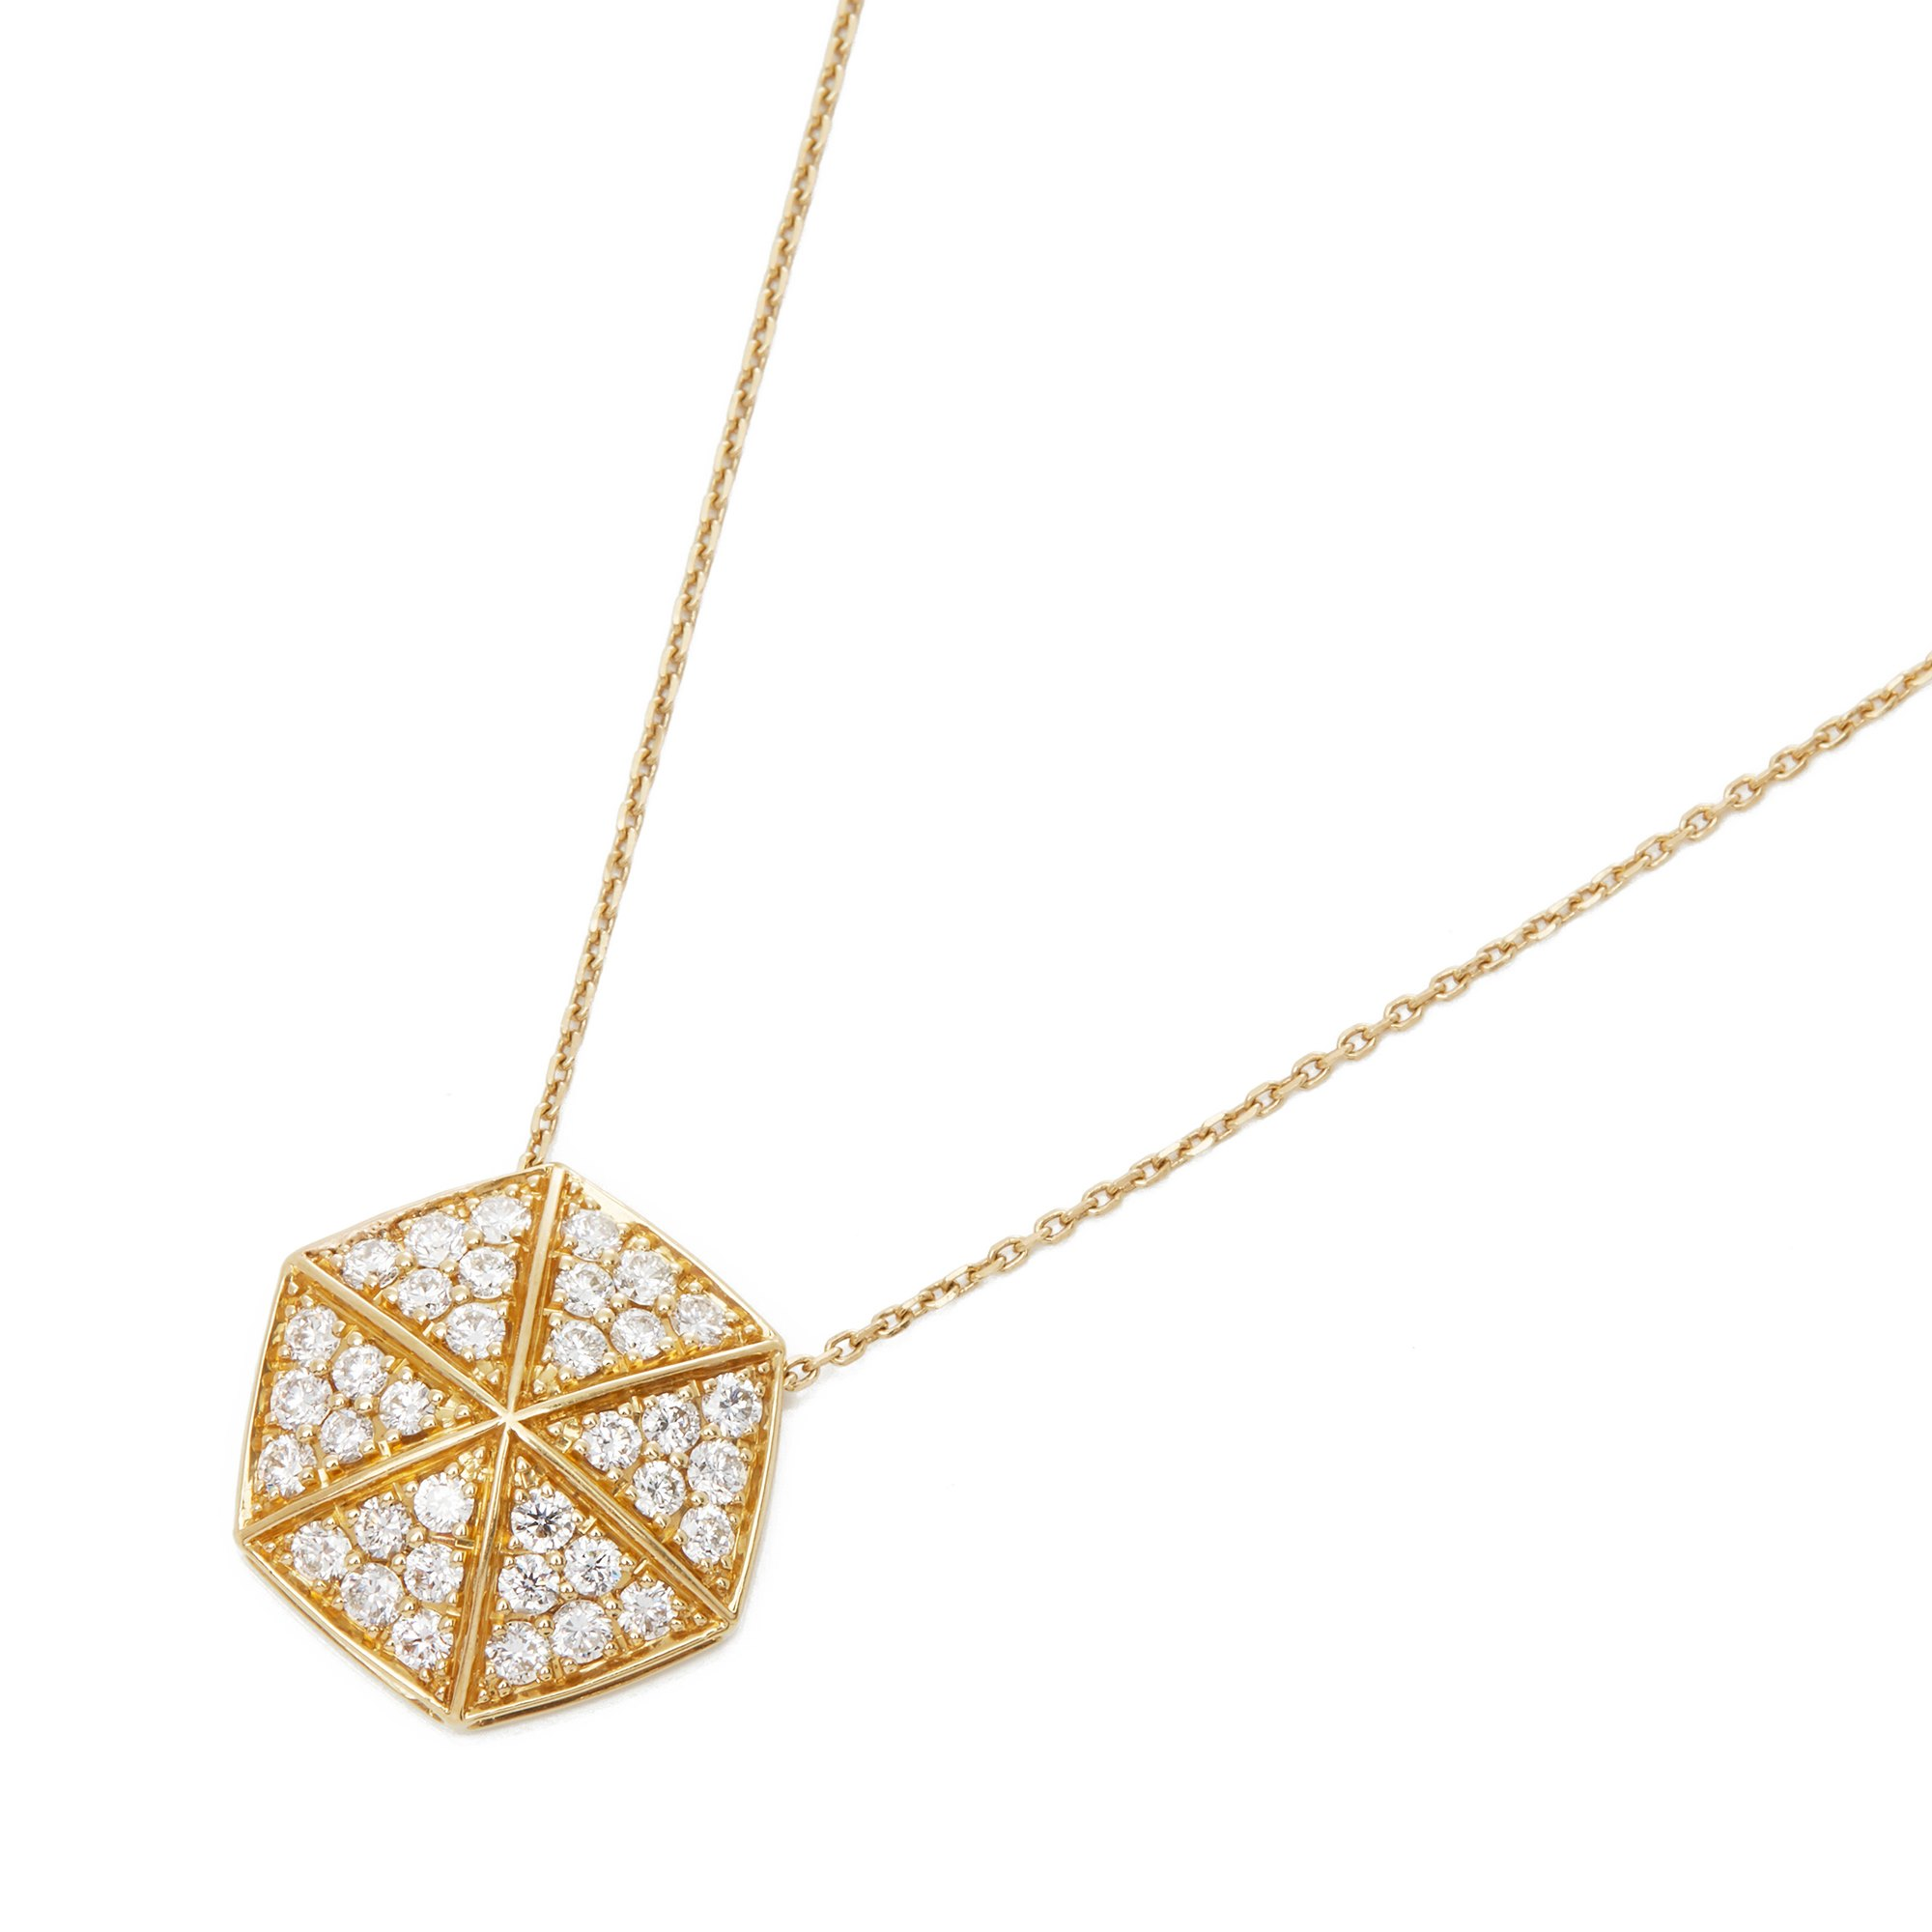 Stephen Webster 18k Yellow Gold full Pave Diamond Deco Pendant